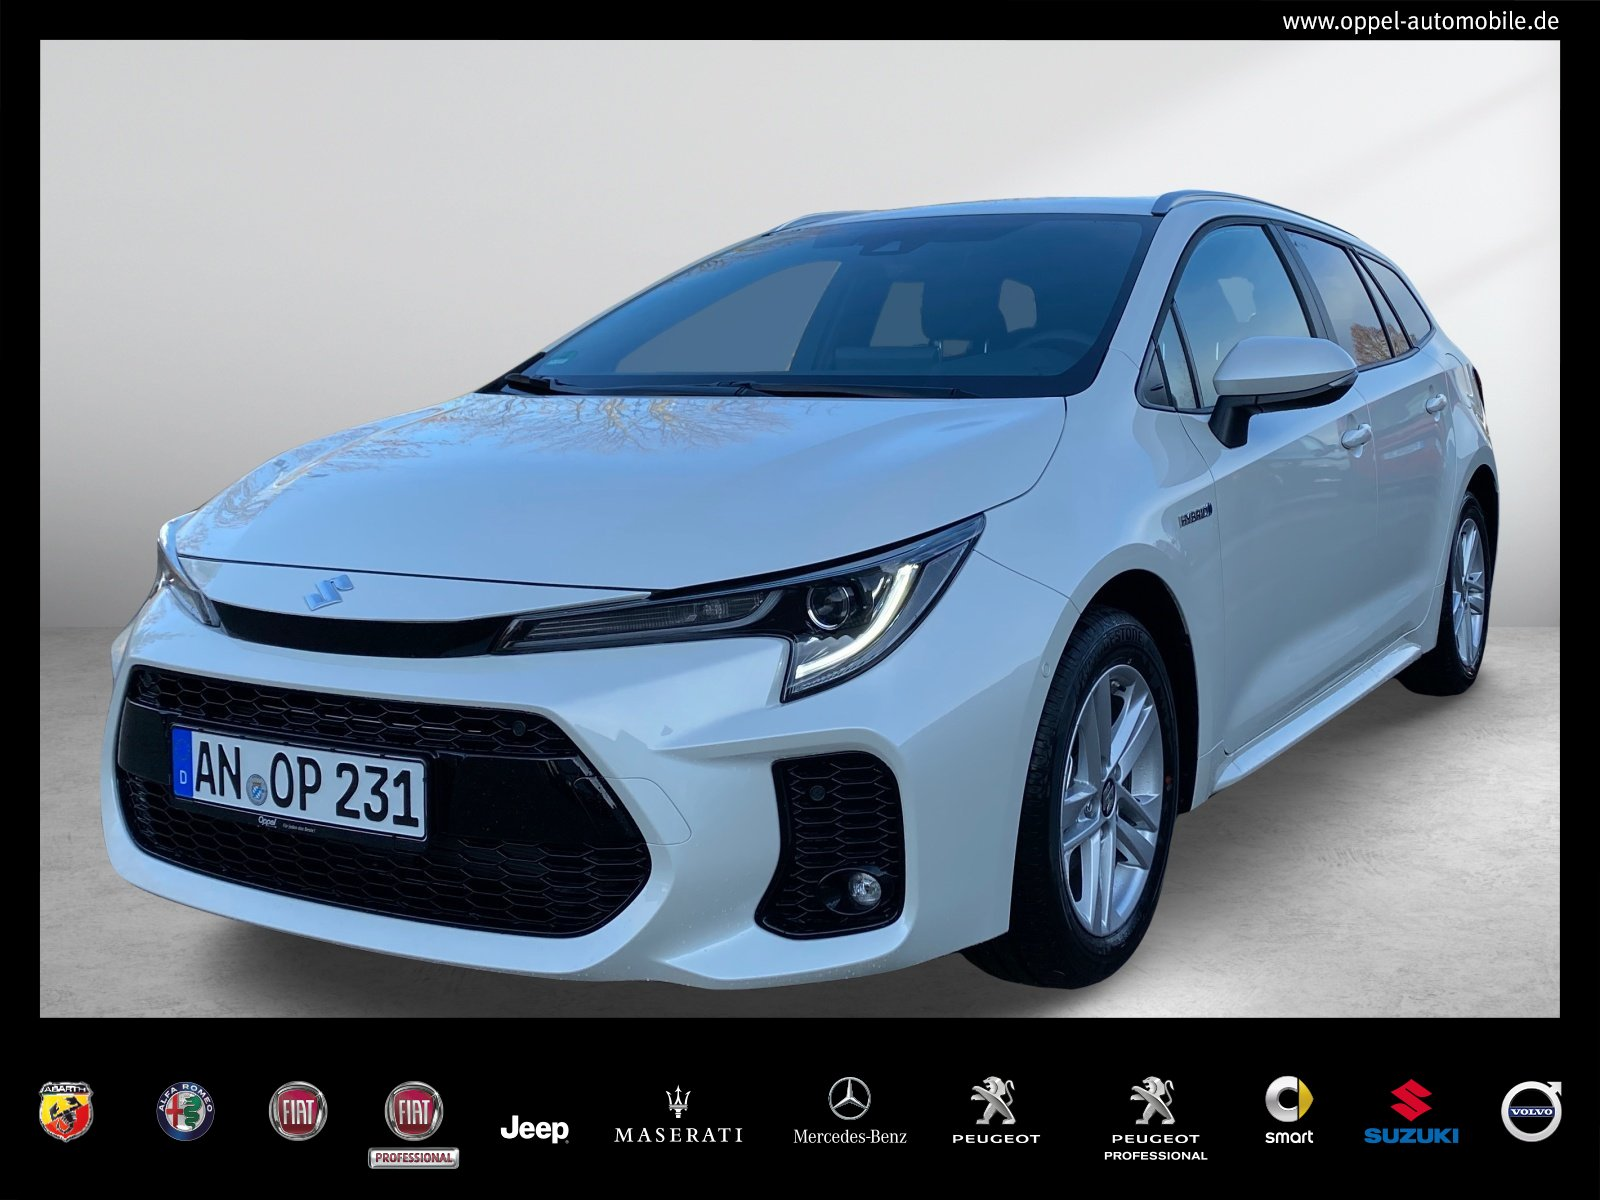 Suzuki Swace 1.8 Comfor+ CVT Hyb. RFK+LED+SITZH.+KLIMA, Jahr 2020, Hybrid